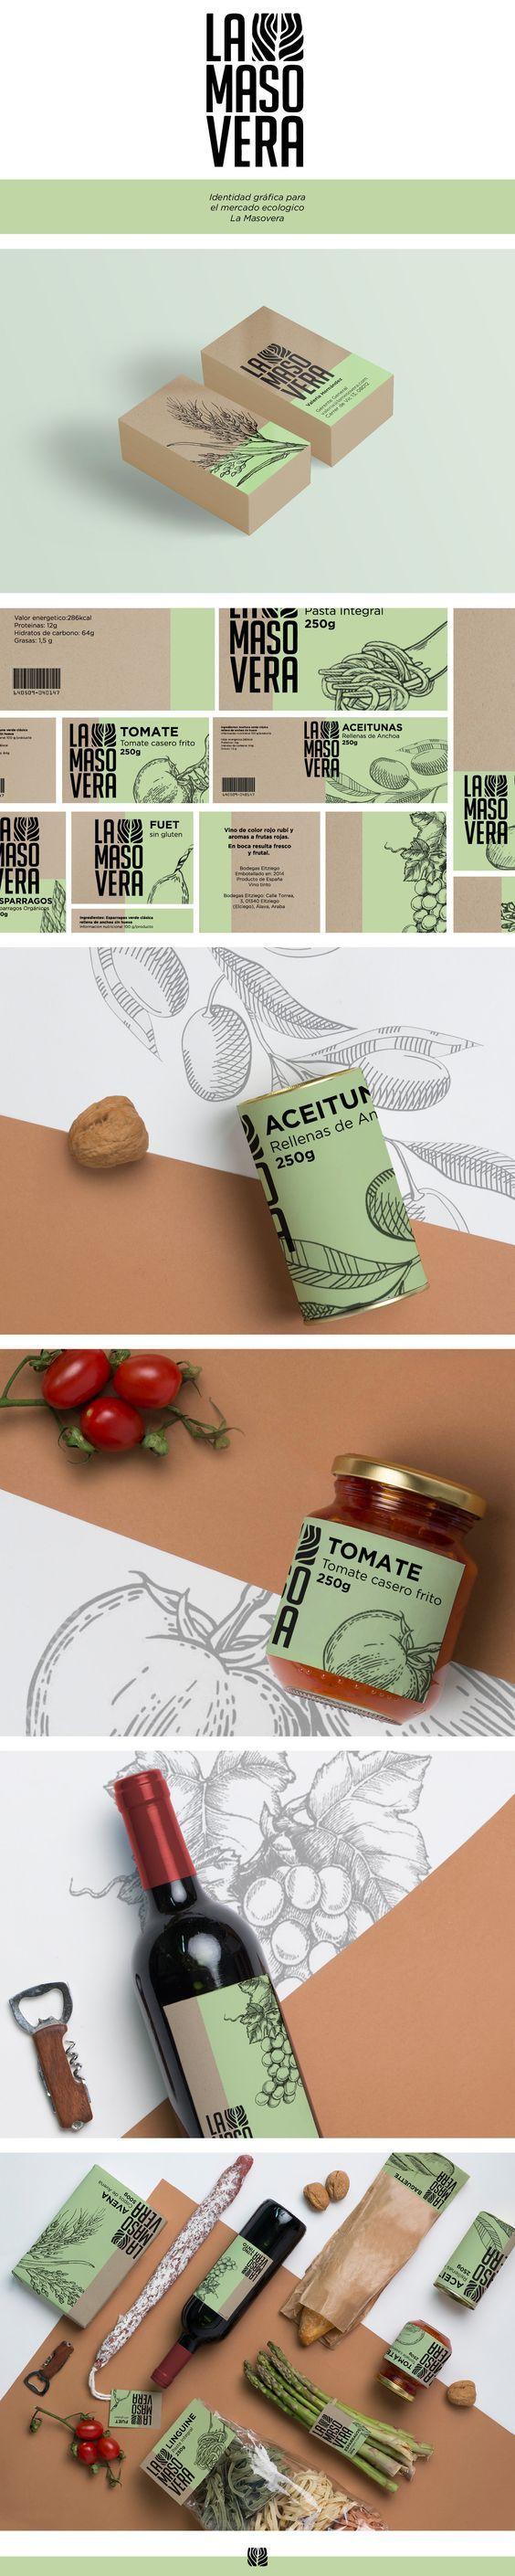 La Masovera Food Branding and Packaging by Valeria Hernandez | Fivestar Branding Agency – Design and Branding Agency & Curated Inspiration Gallery